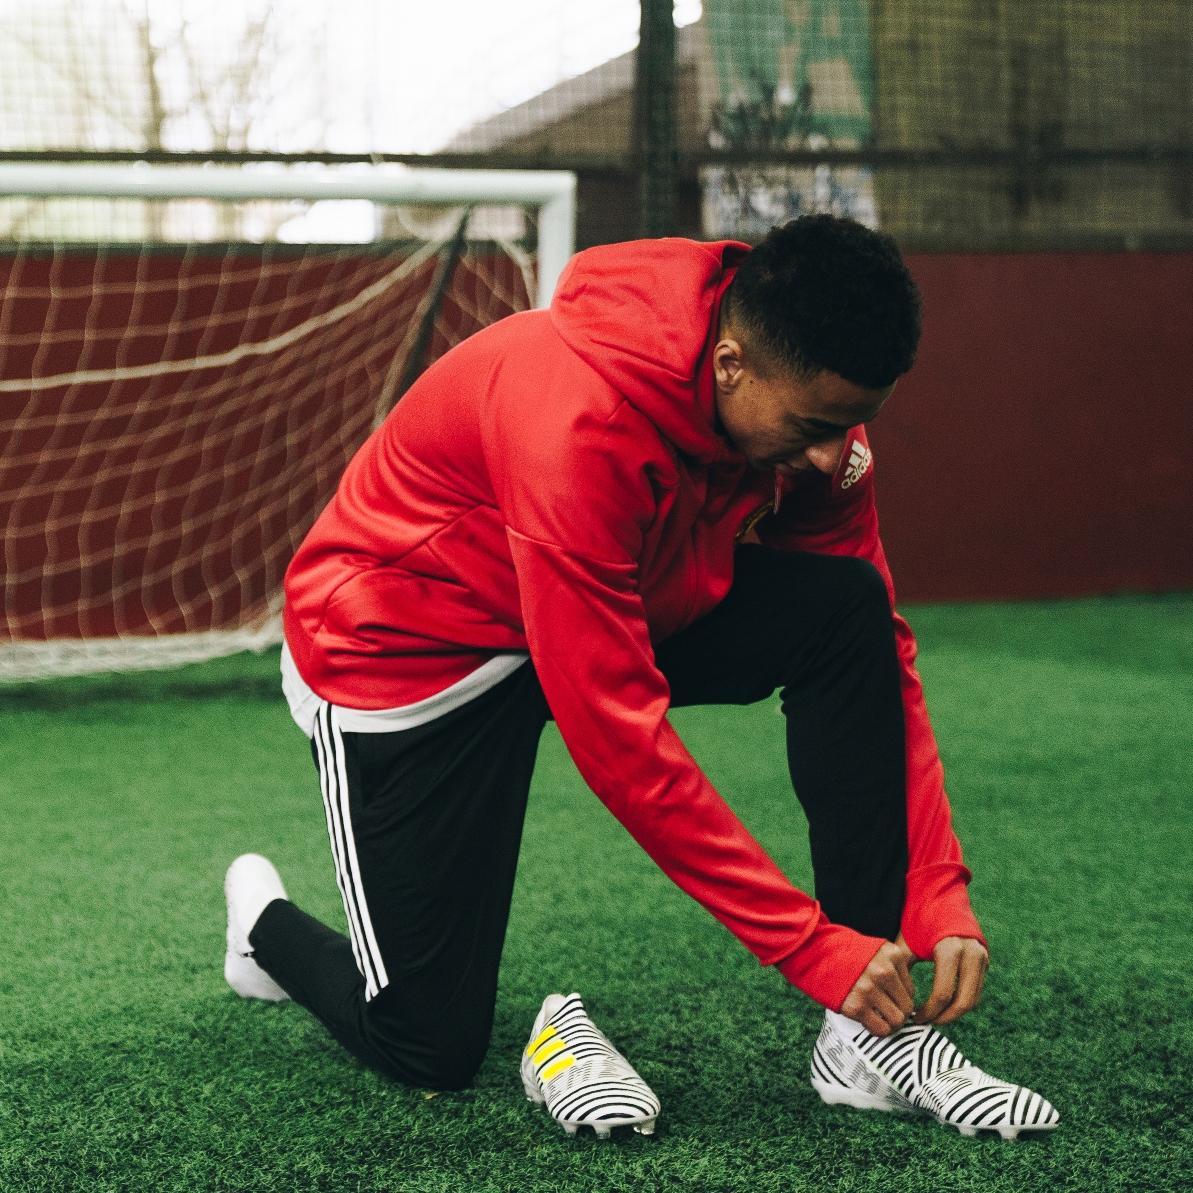 The next chapter.  #NEMEZIZ @JesseLingard #HereToCreate #MUFC